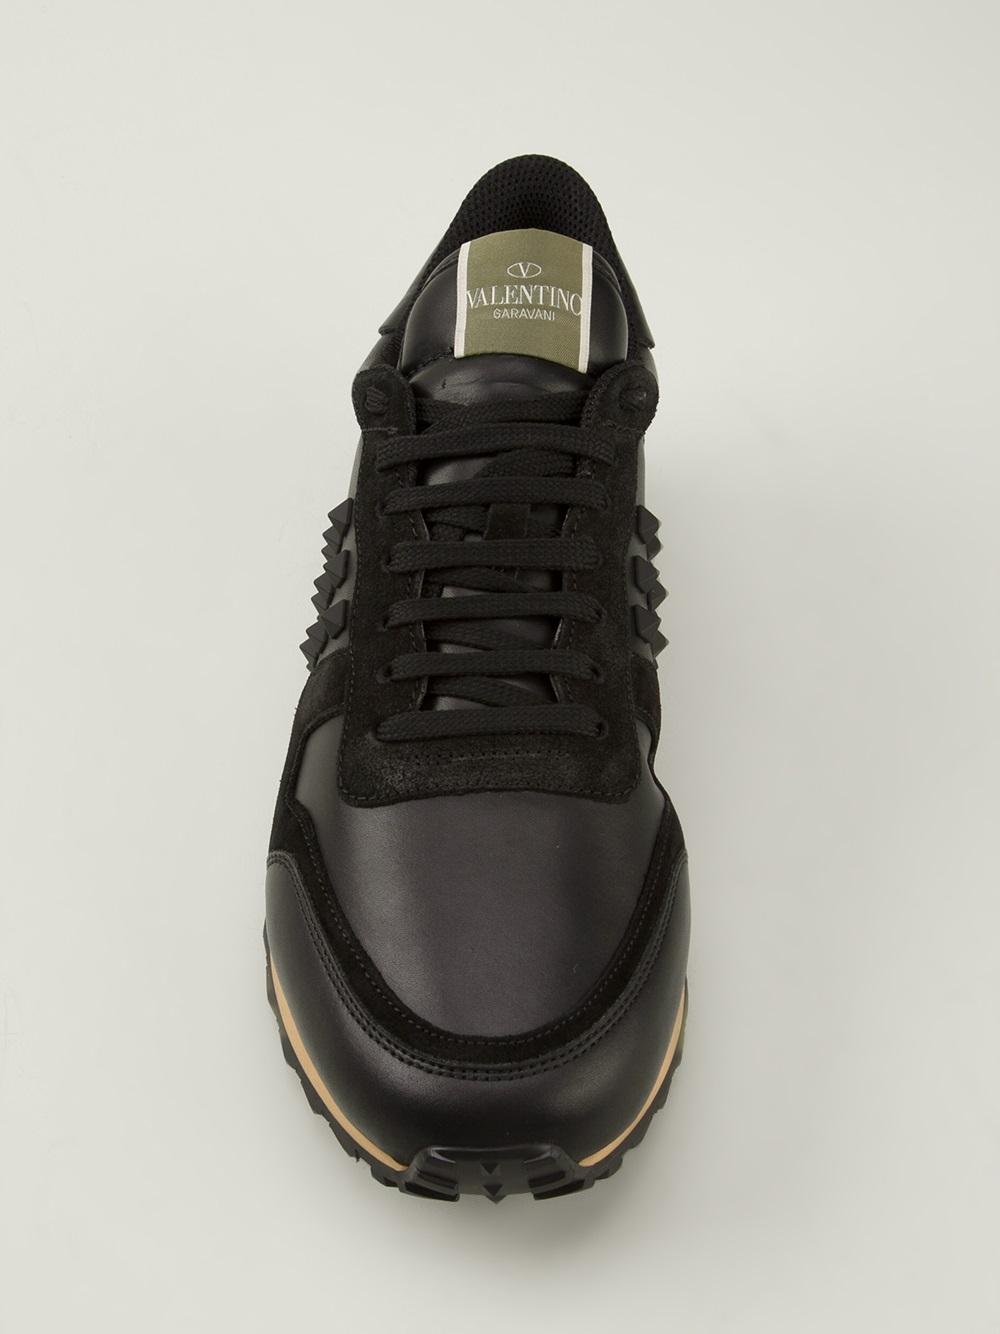 Valentino Shoes Rockstud Uk